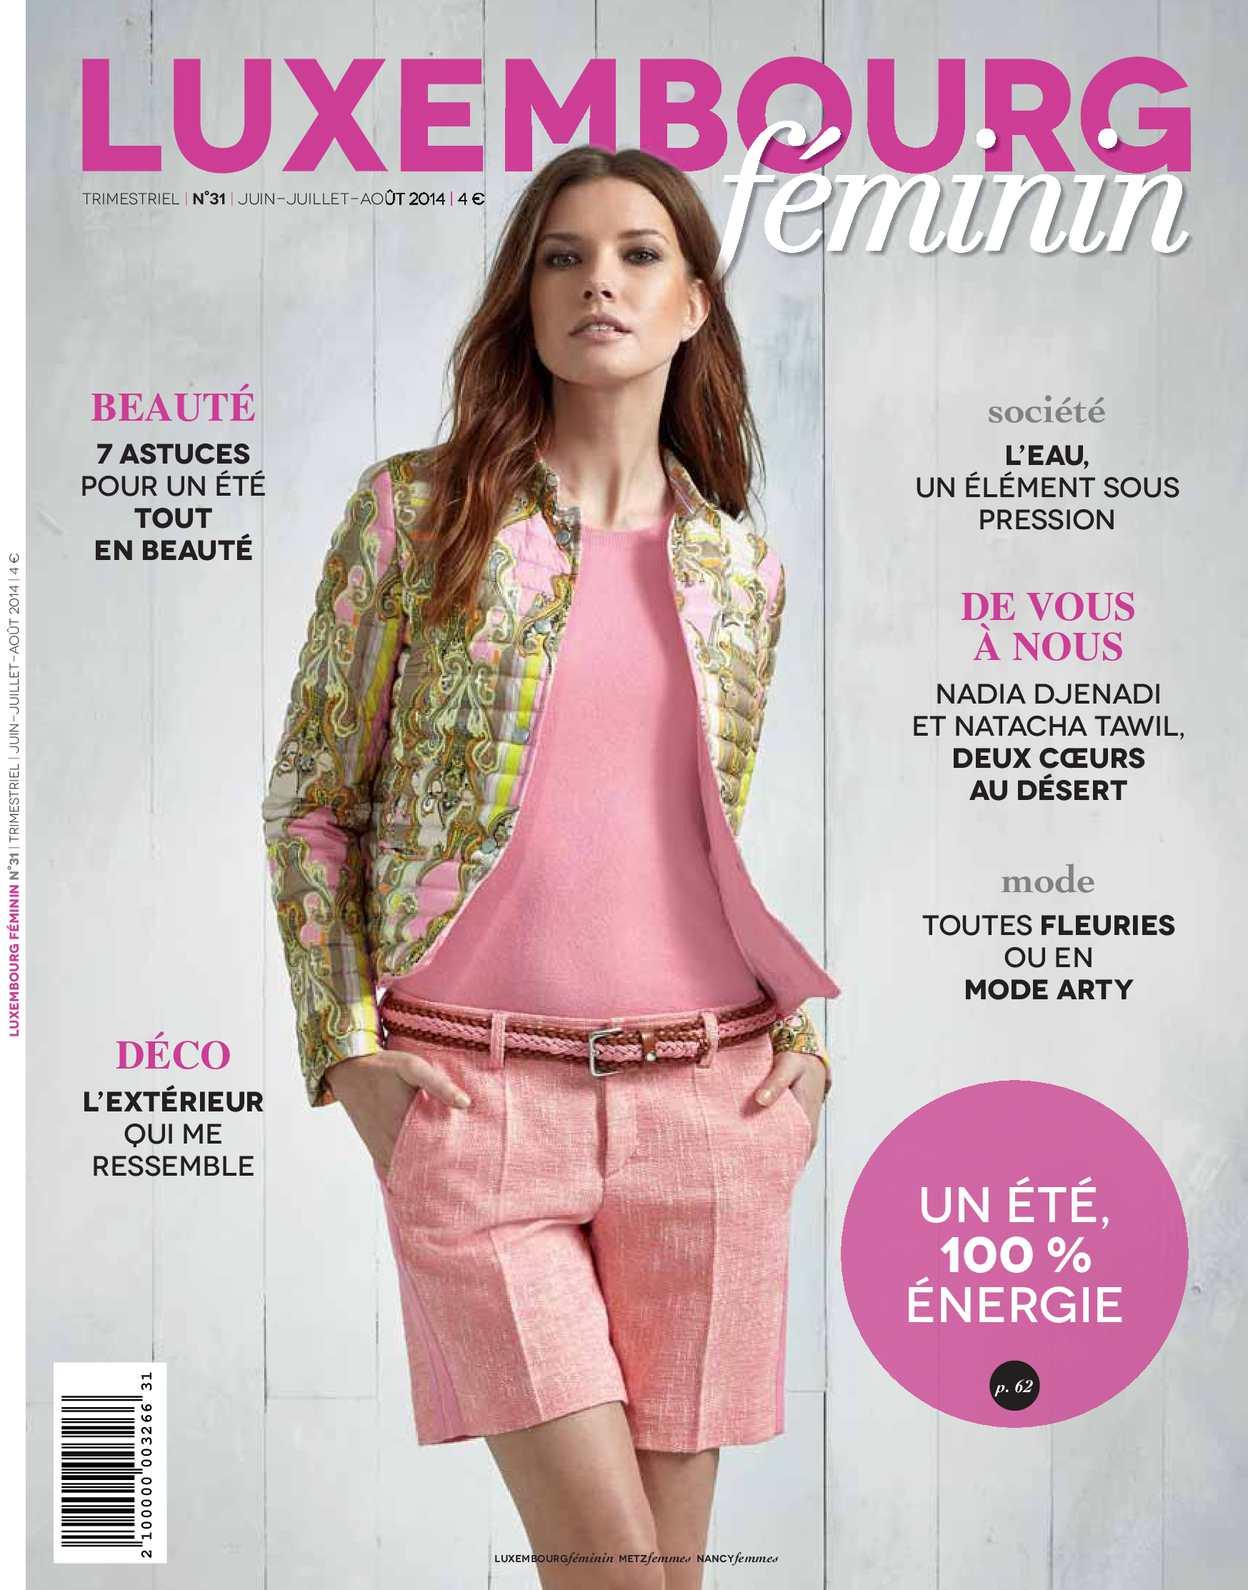 Luxembourg Féminin N°31